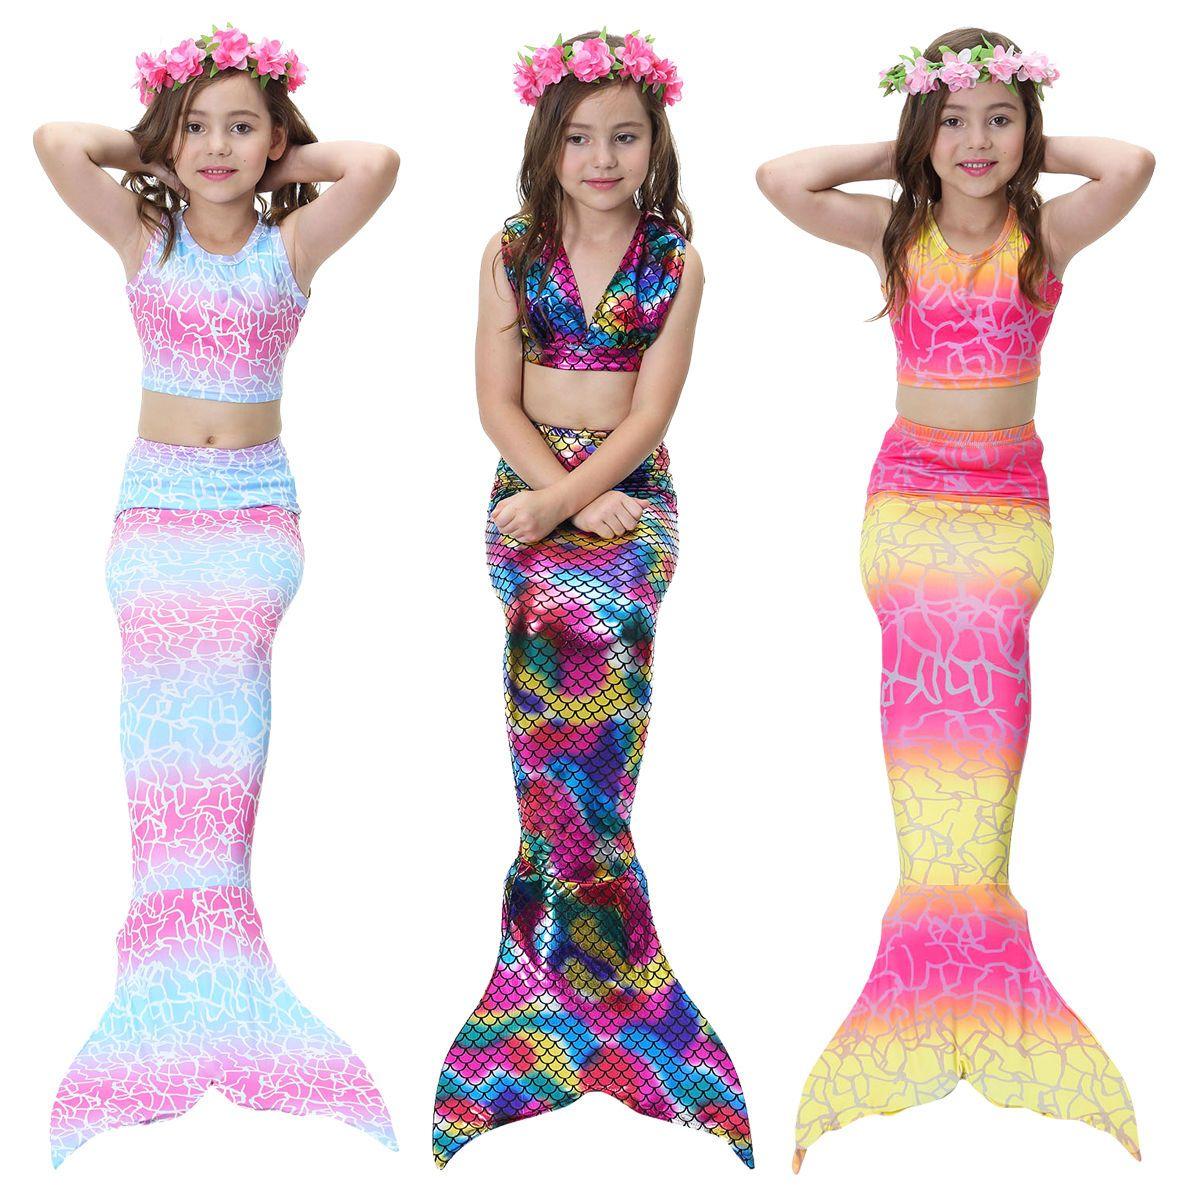 01226a2d5caa6 New Kids Girls 3Pcs Mermaid Tail Swimming Bikini Set Swimwear Mono Fin  Swimmable